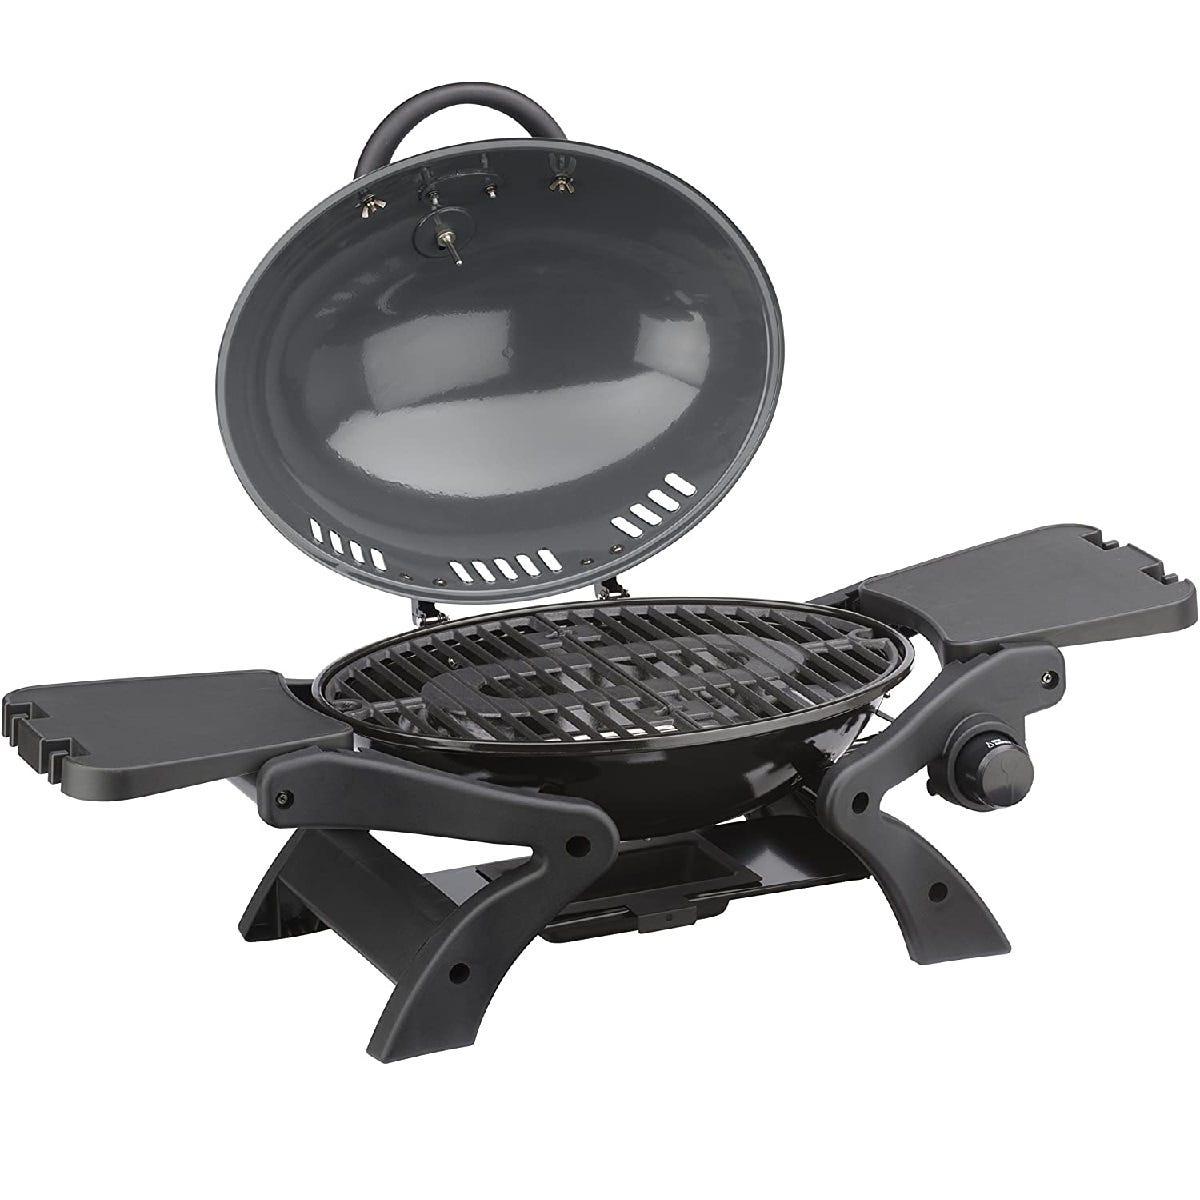 Landmann Grill Chef Portable Gas BBQ